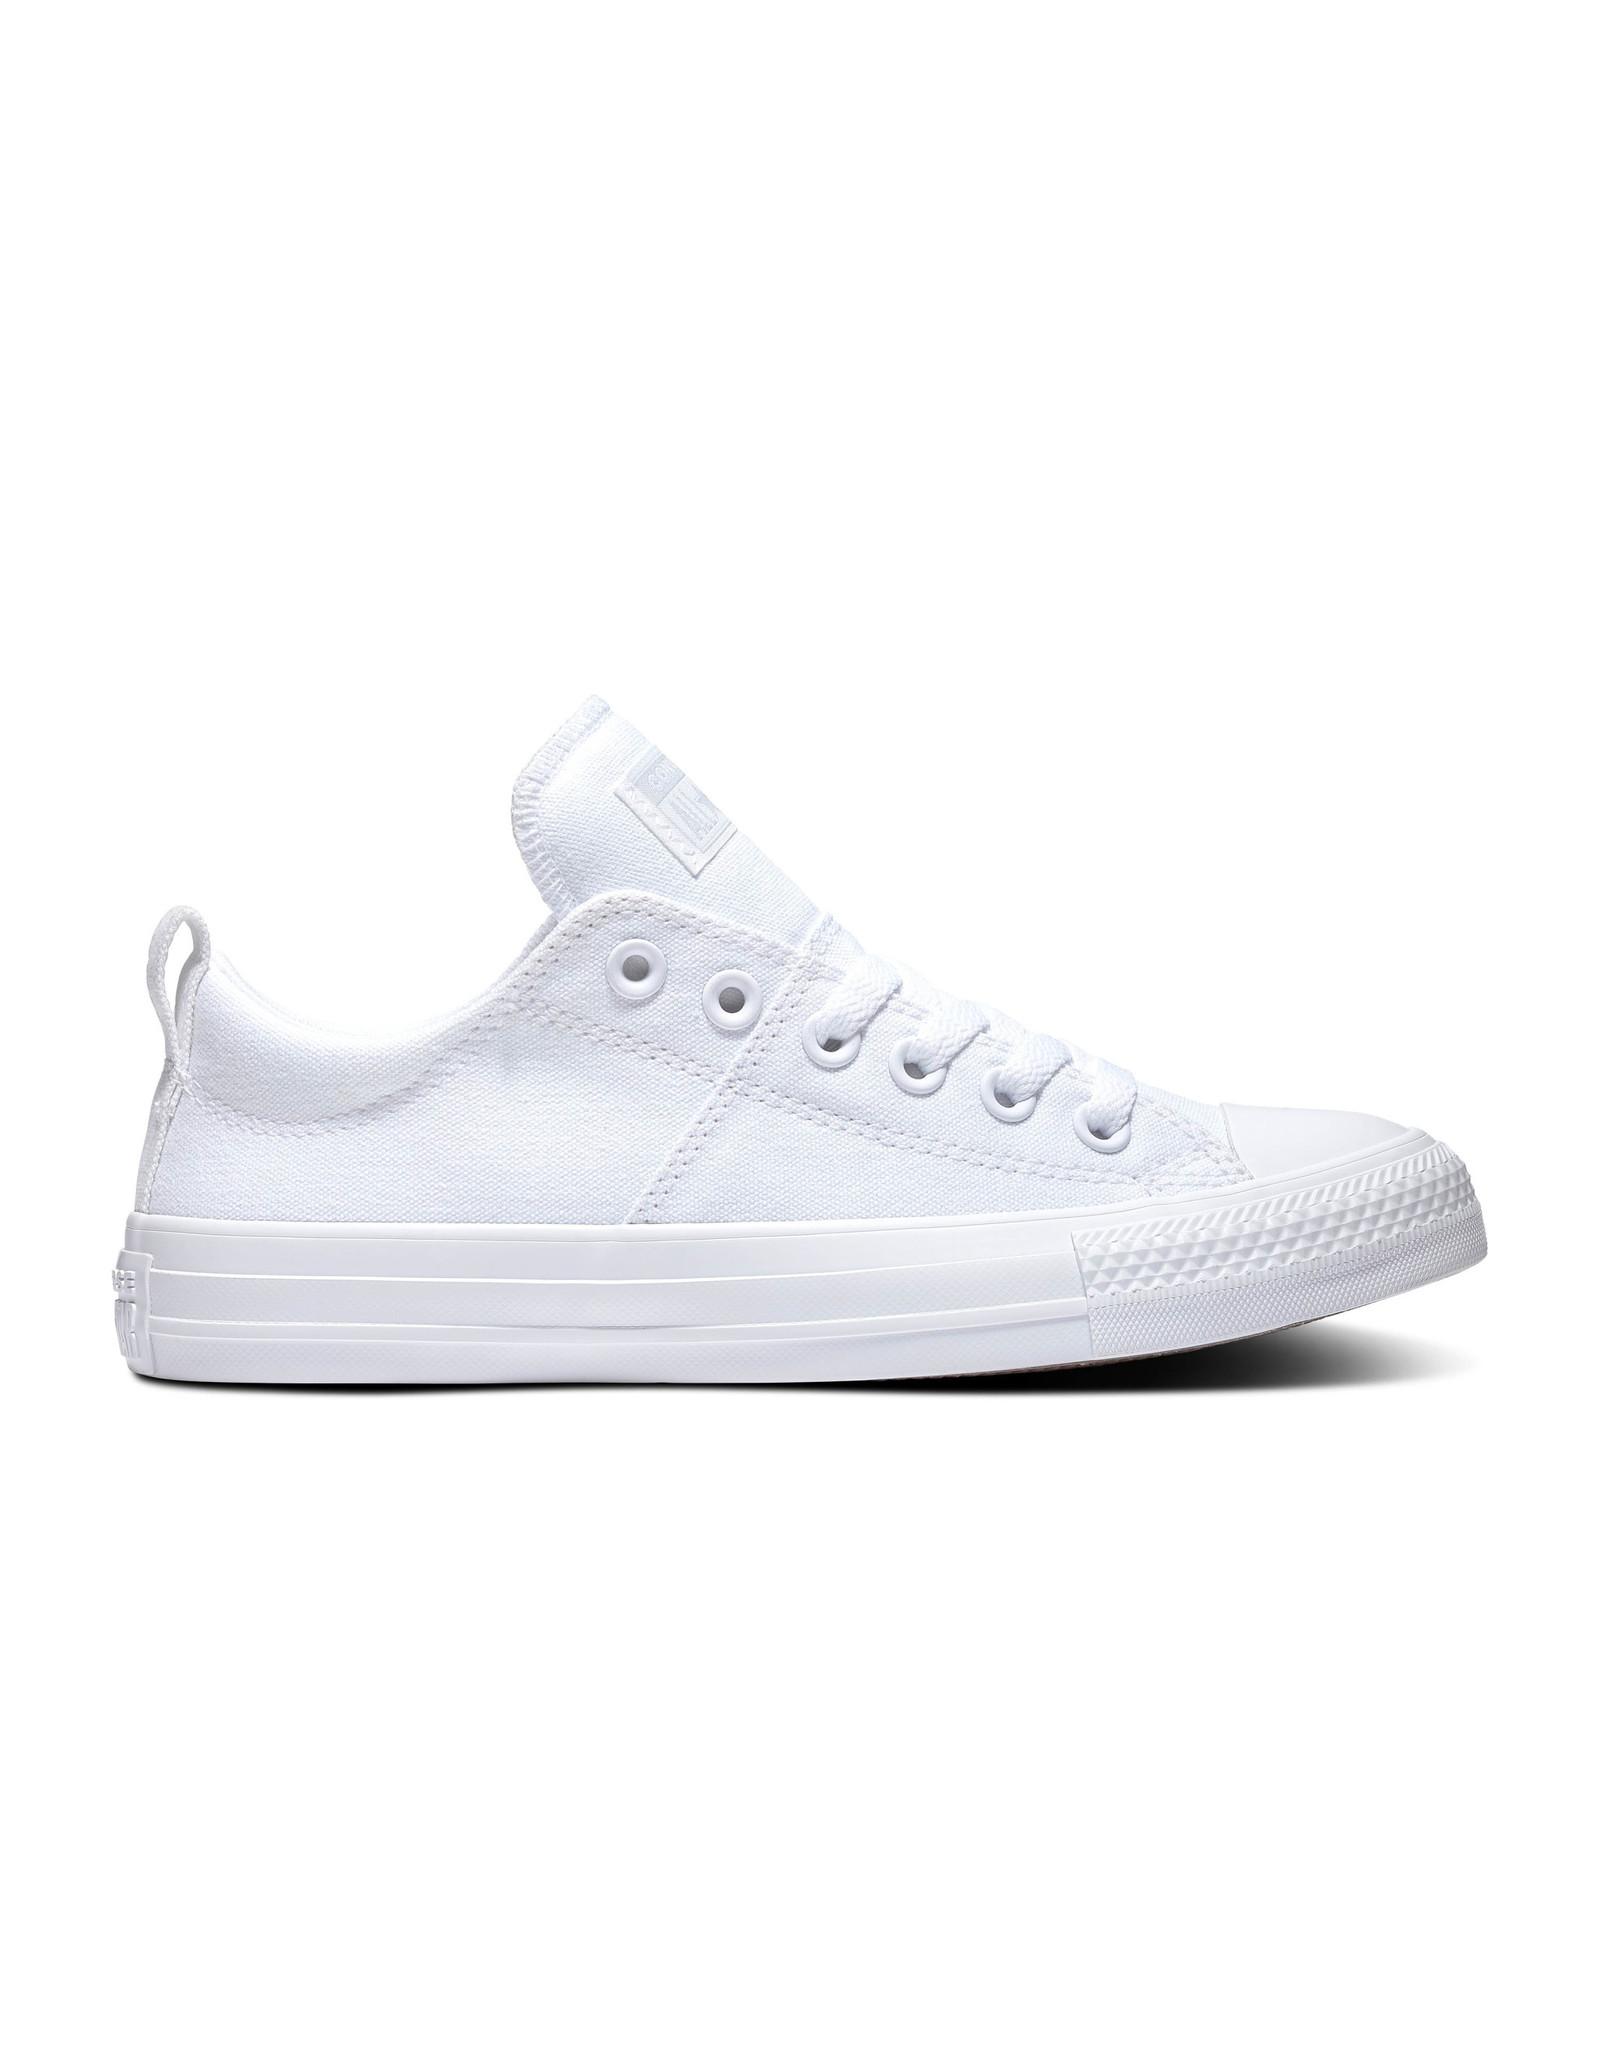 CONVERSE CHUCK TAYLOR MADISON OX WHITE/WHITE/WHITE C14MAW-568099C